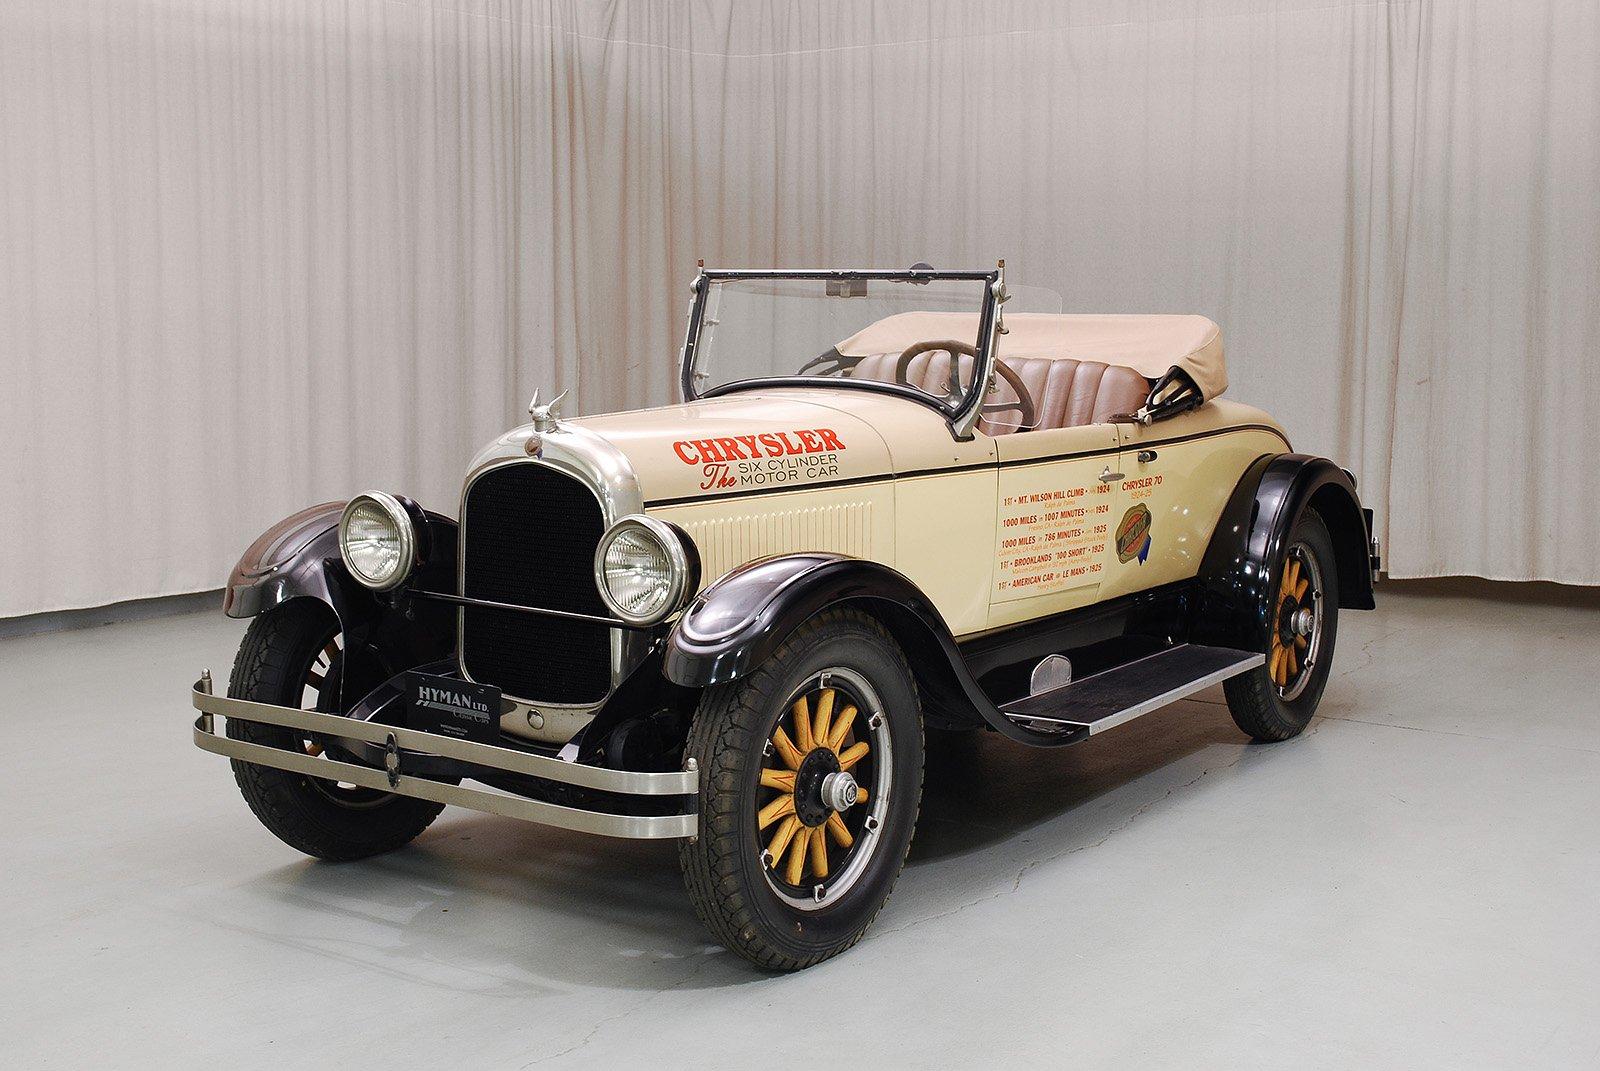 1925 Chrysler 70 Roadster Classic Cars Hyman Ltd